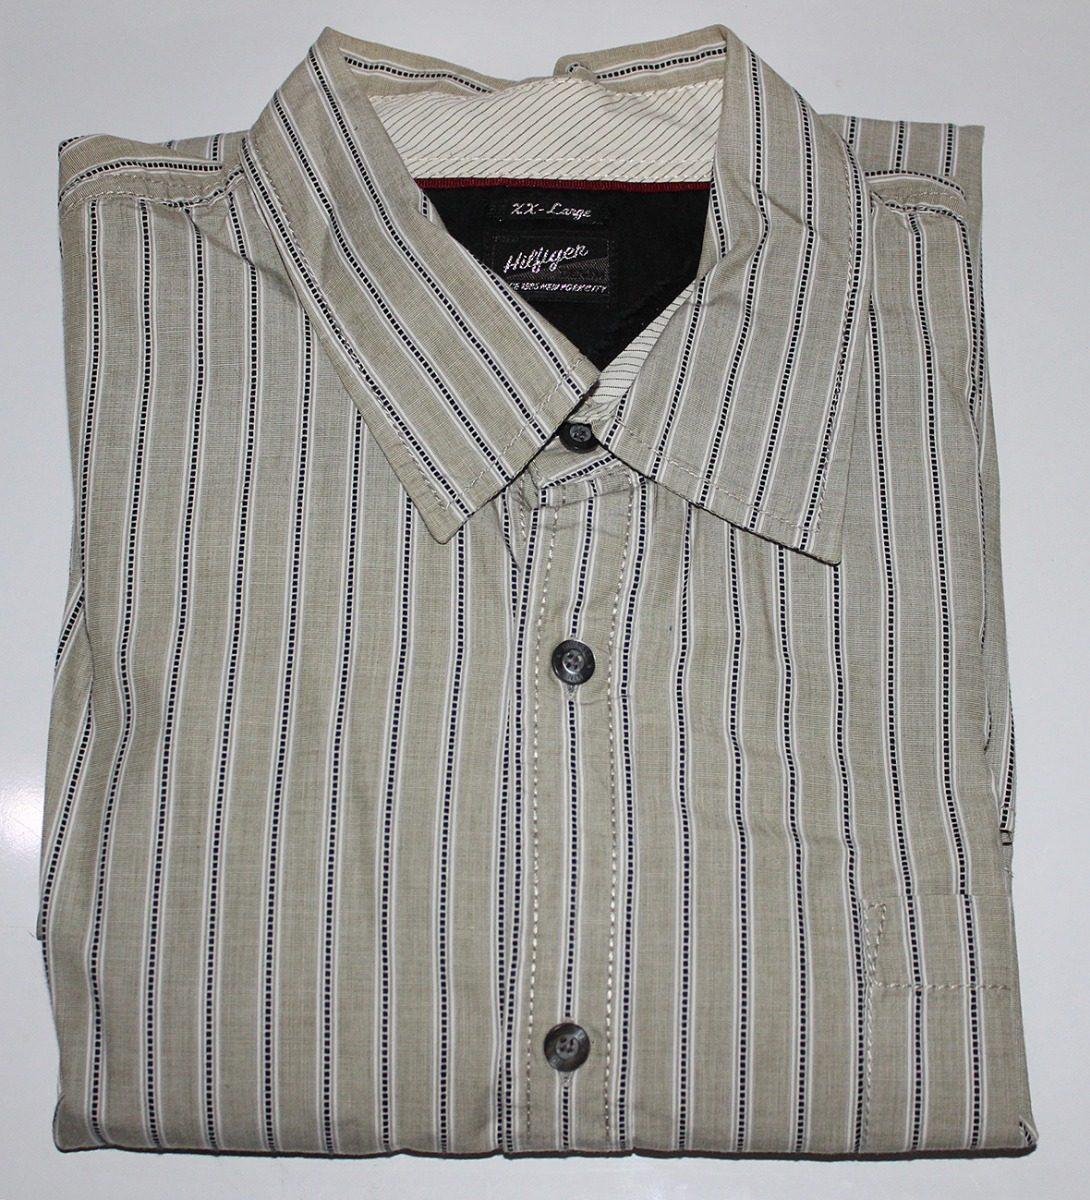 5f5d4eb1cb0 camisa tommy hilfiger denim caballero original manga larga. Cargando zoom.